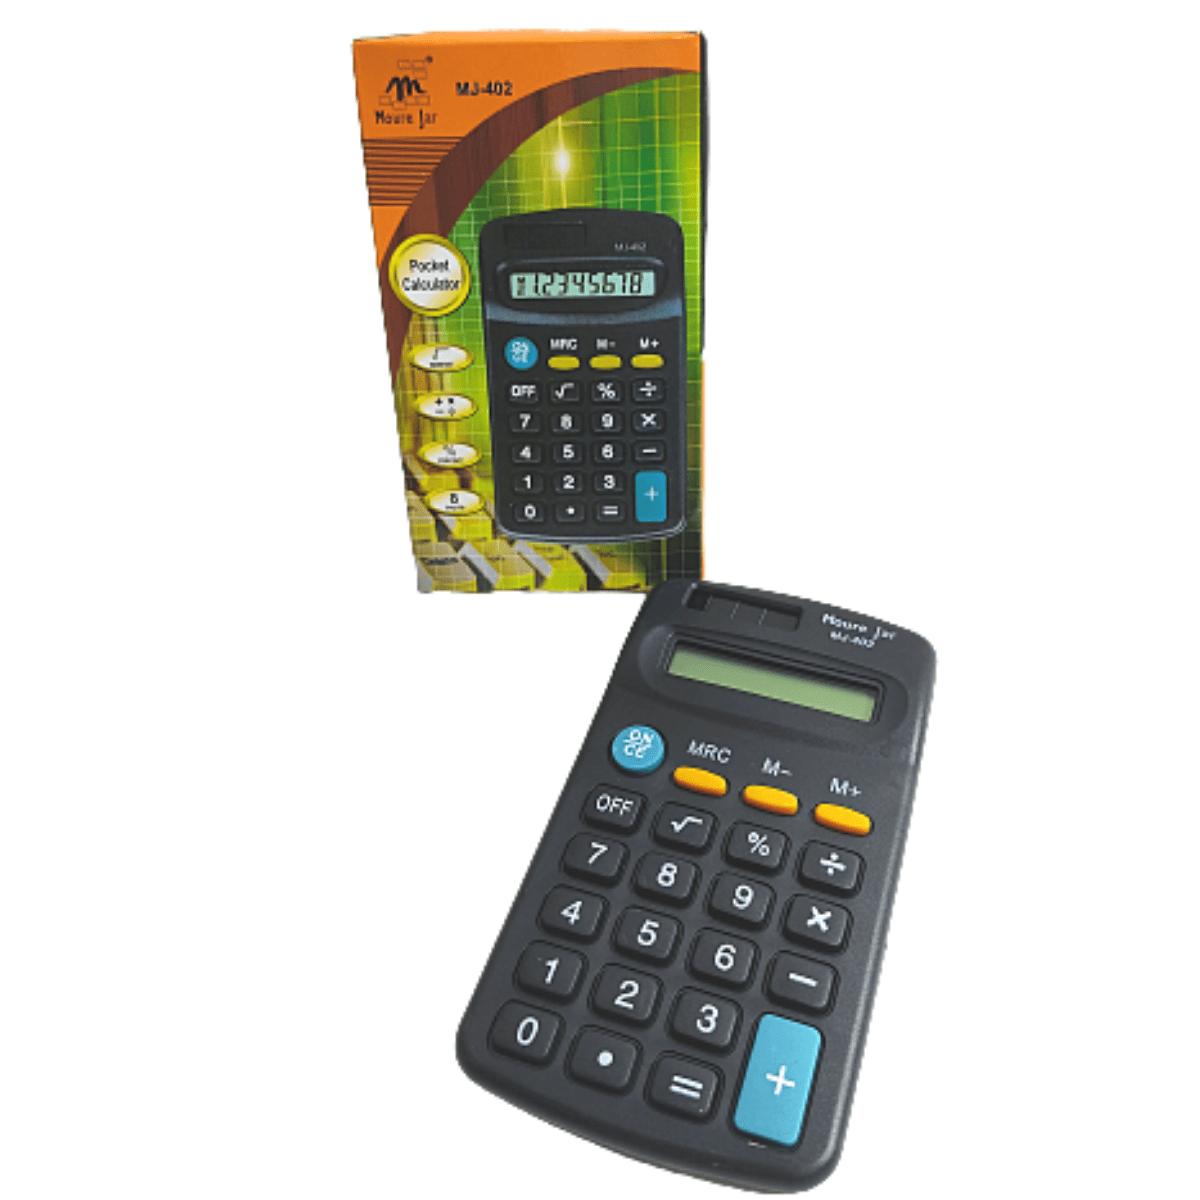 Calculadora Portátil Mini Eletrônica 8 dígitos mj402